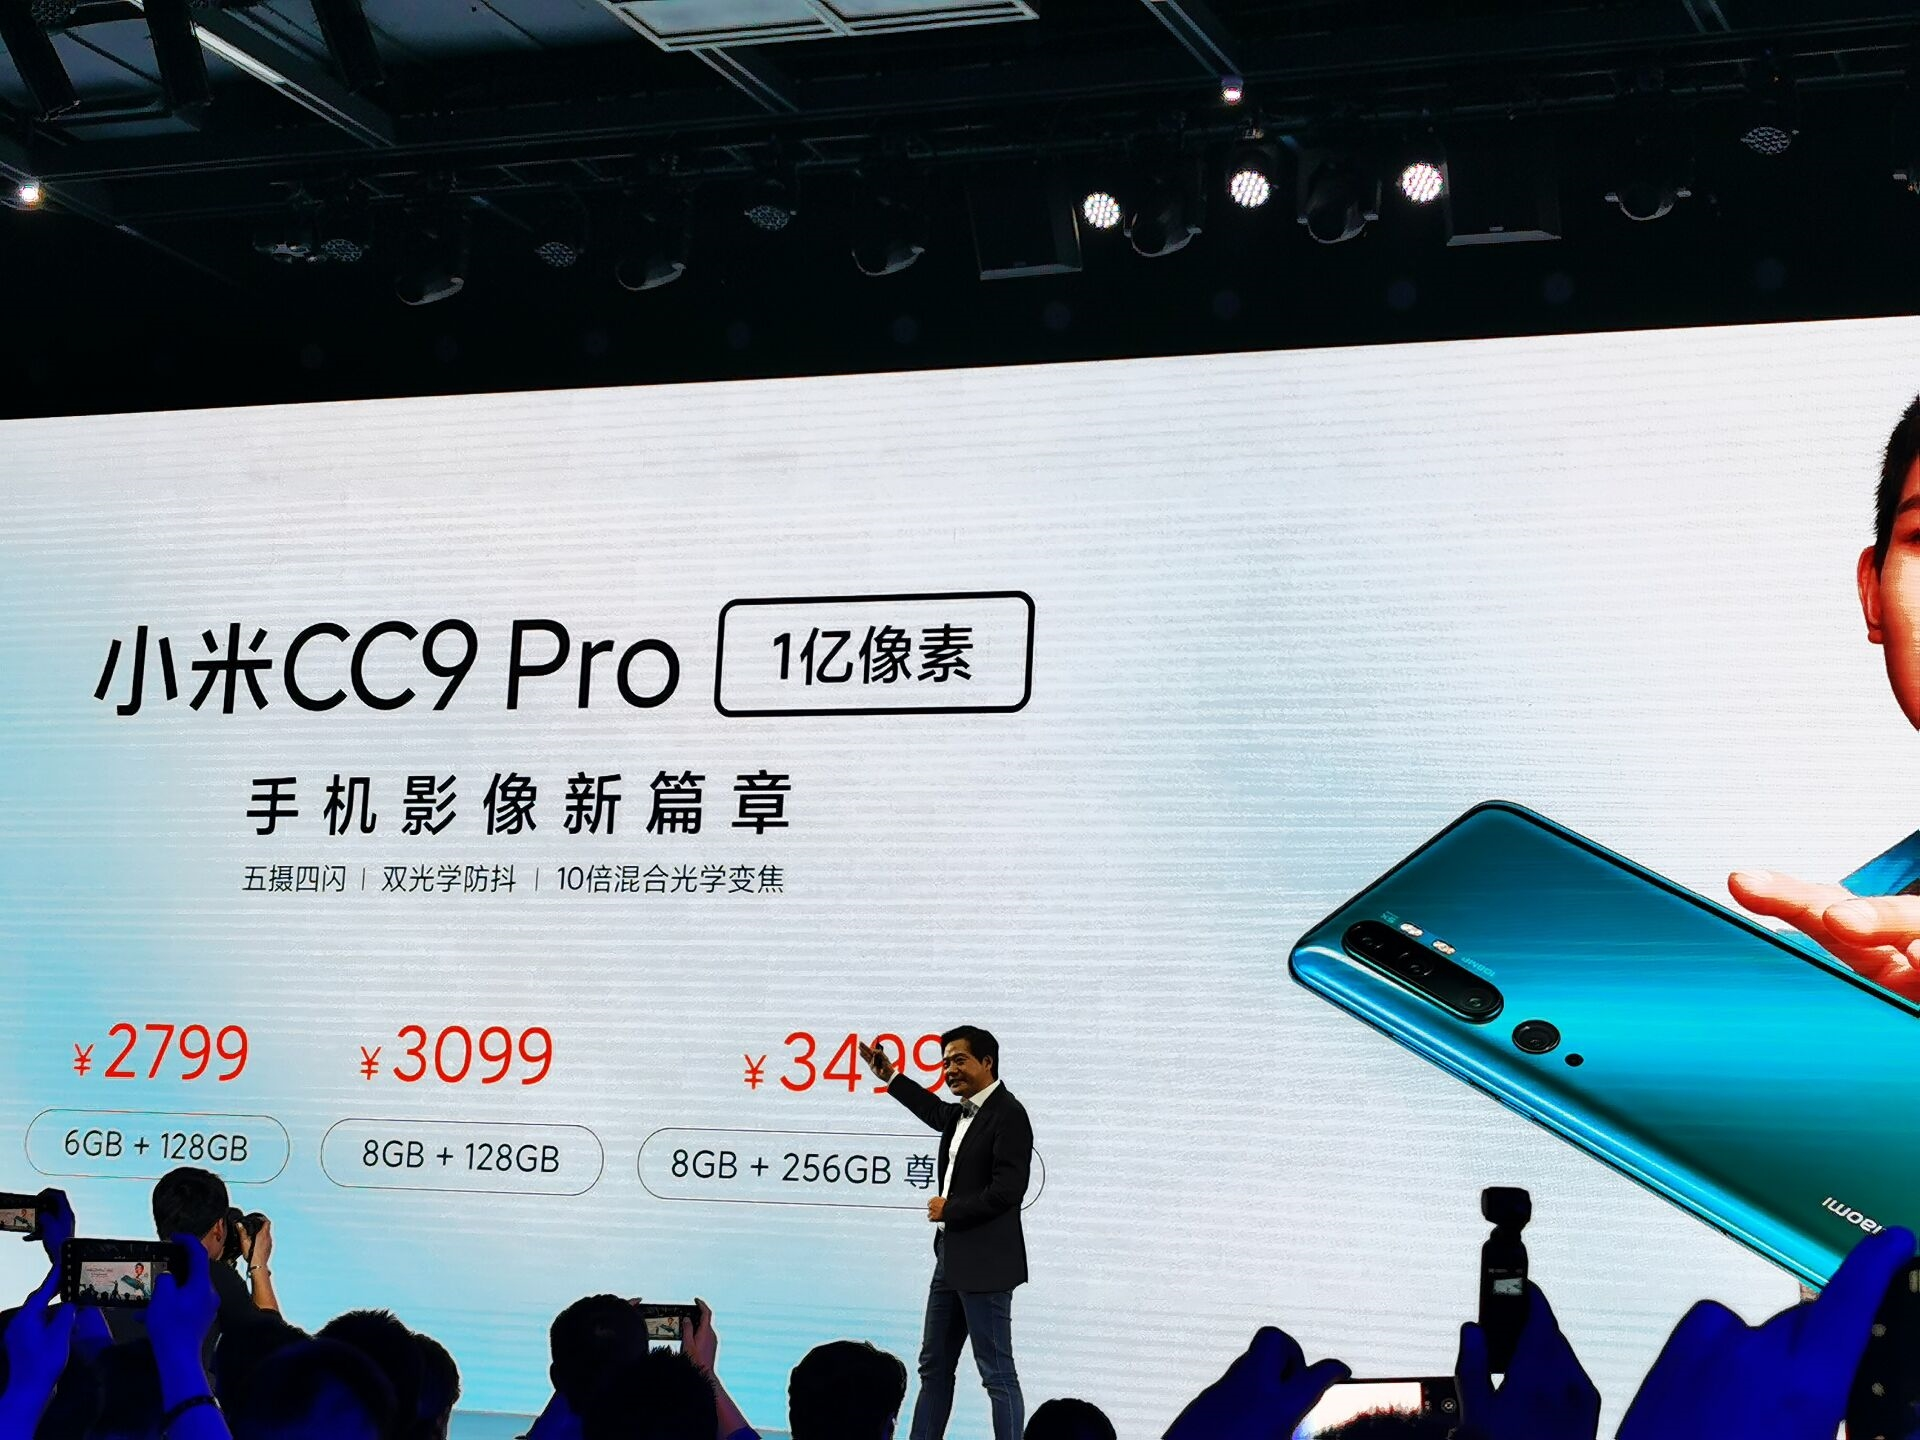 Xiaomi CC9 Pro (Mi Note 10) with World's First 108MP Camera